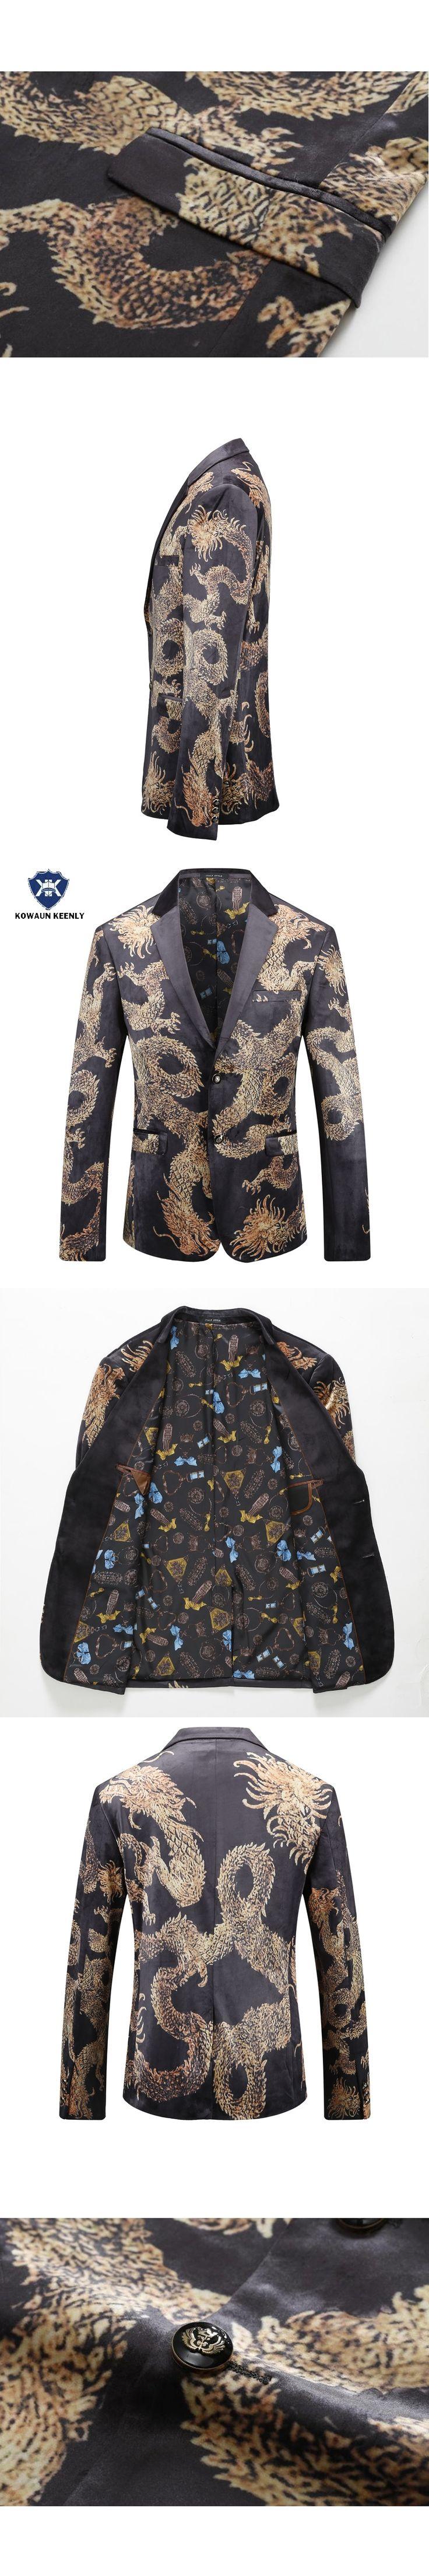 2017 Autumn Black Gold Blazer For Men Chinese style Printed Blazer Men Slim Fit Velvet Suit Jacket Mens Stage Wear Male Singer